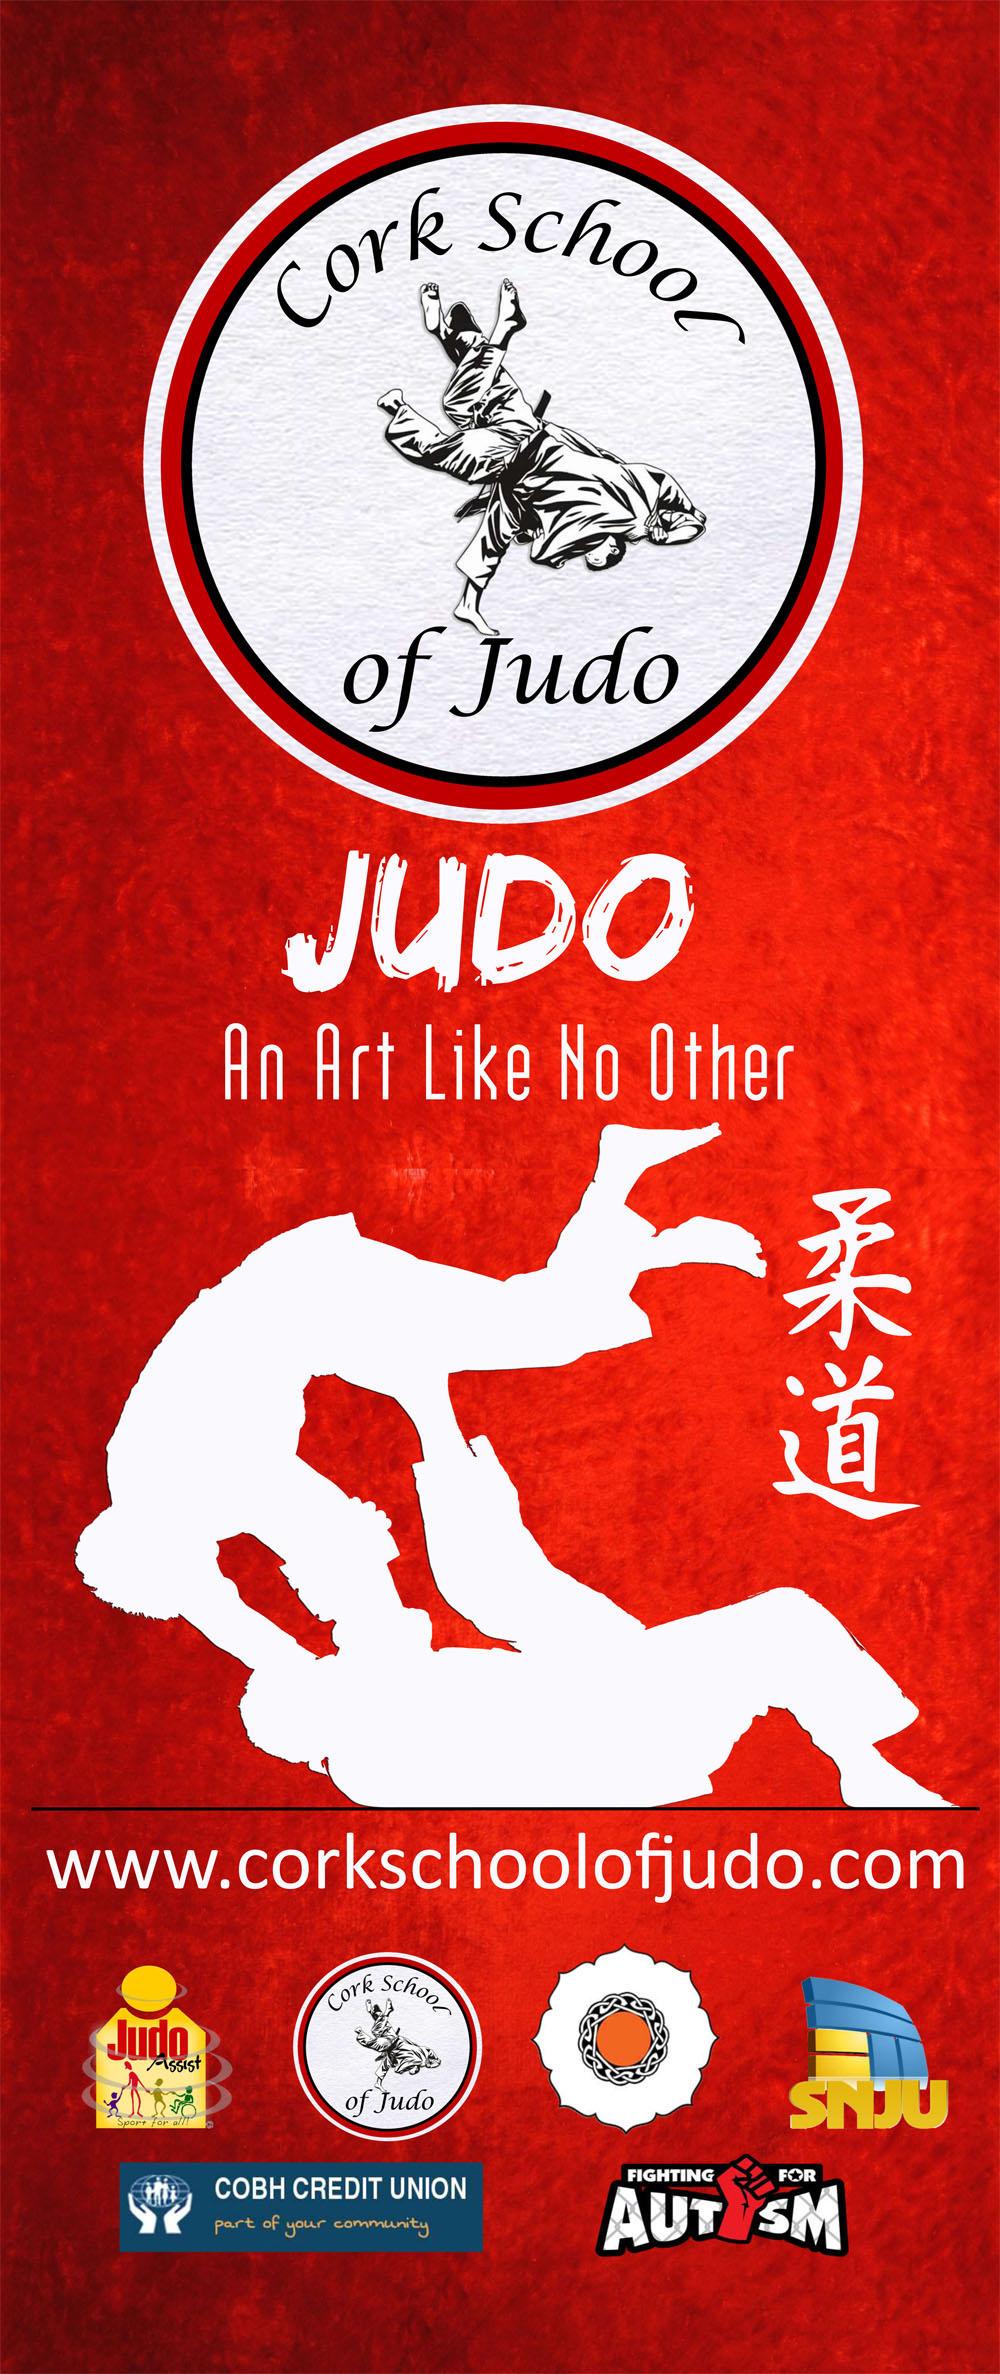 Cork School of Judo Rollup Banner